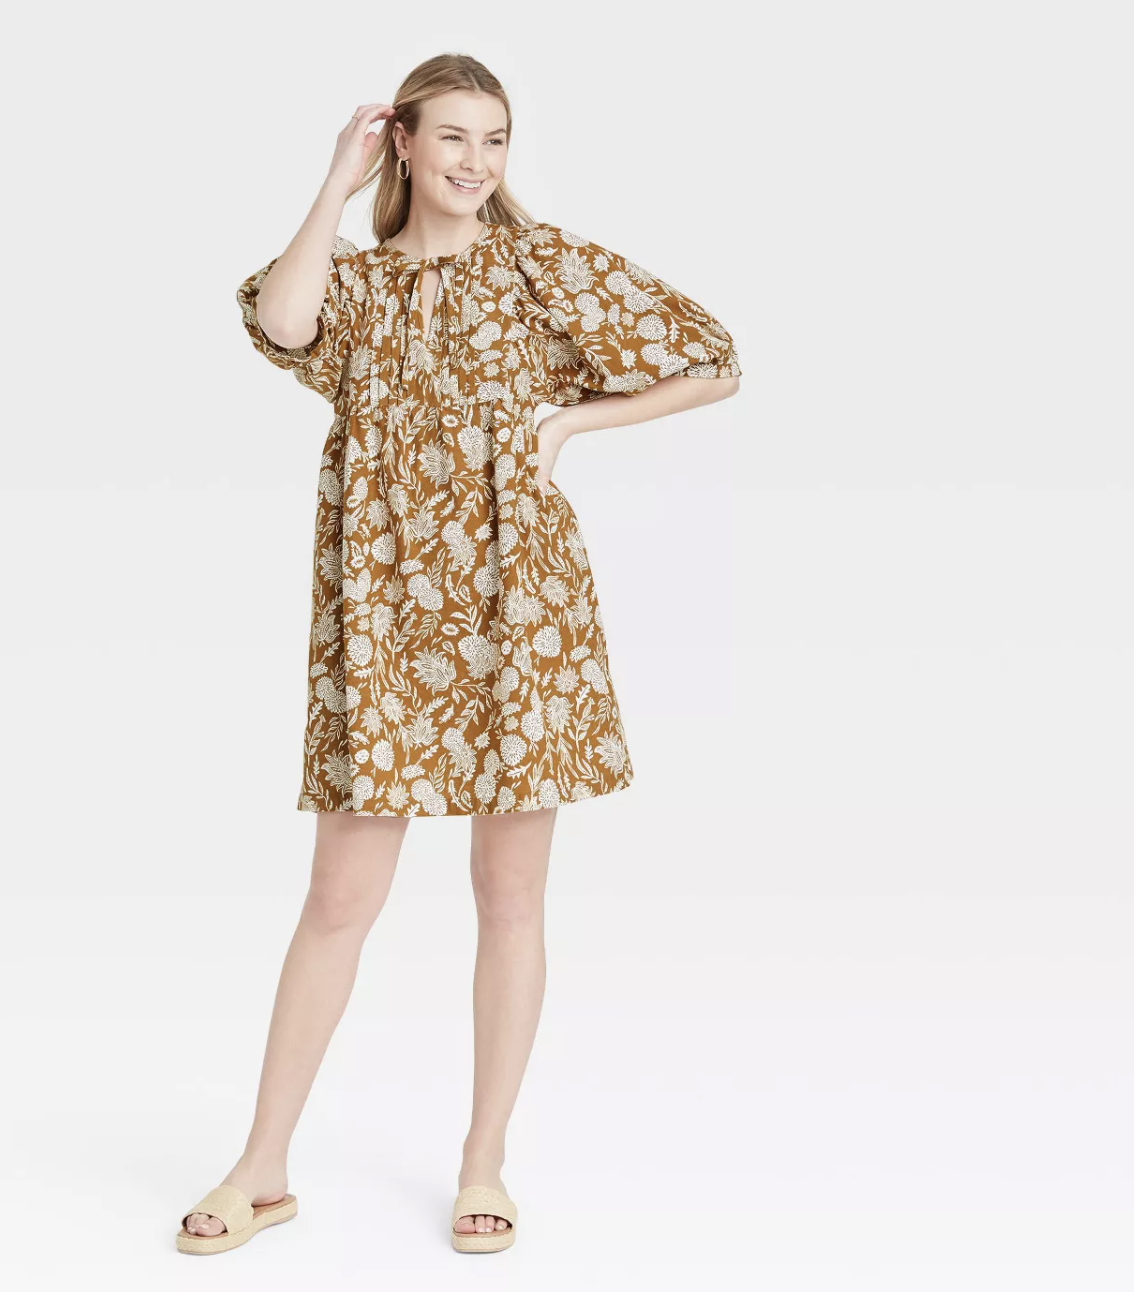 target nightgown dress | This Weeks Good Things 4.5.21